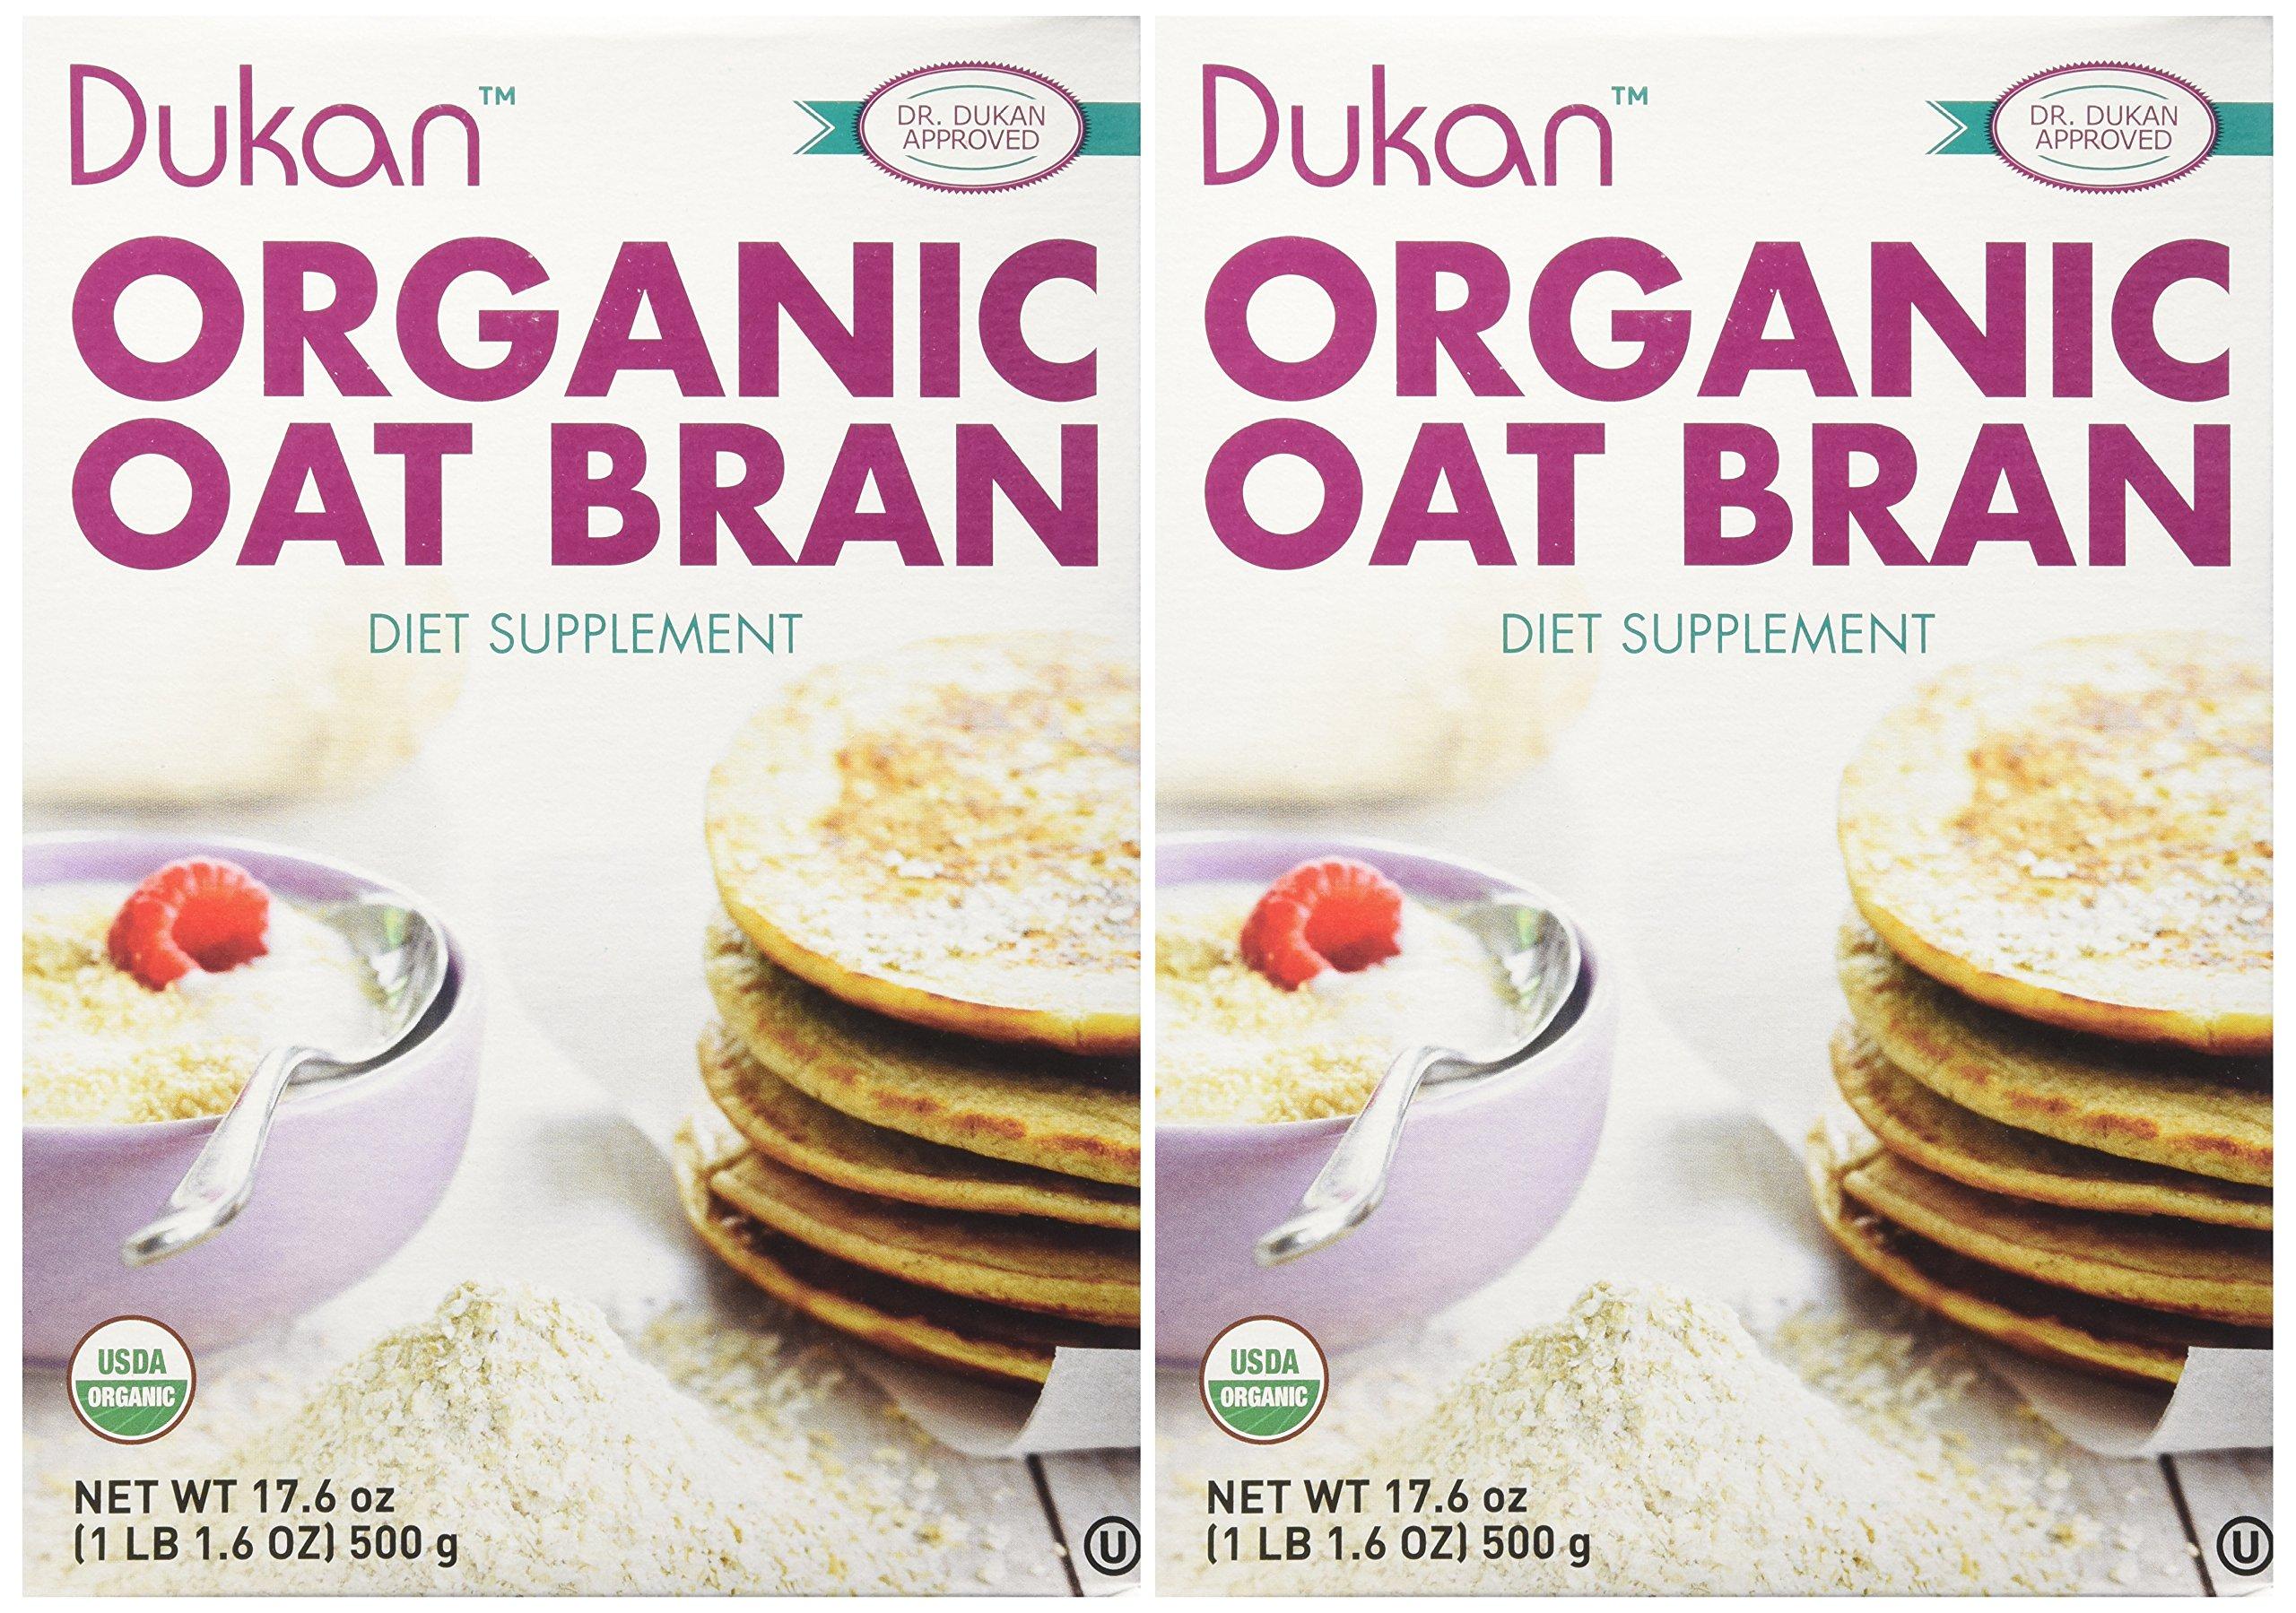 Dukan Diet, Organic Oat Bran, 17.6 oz (500 g) - 2pc